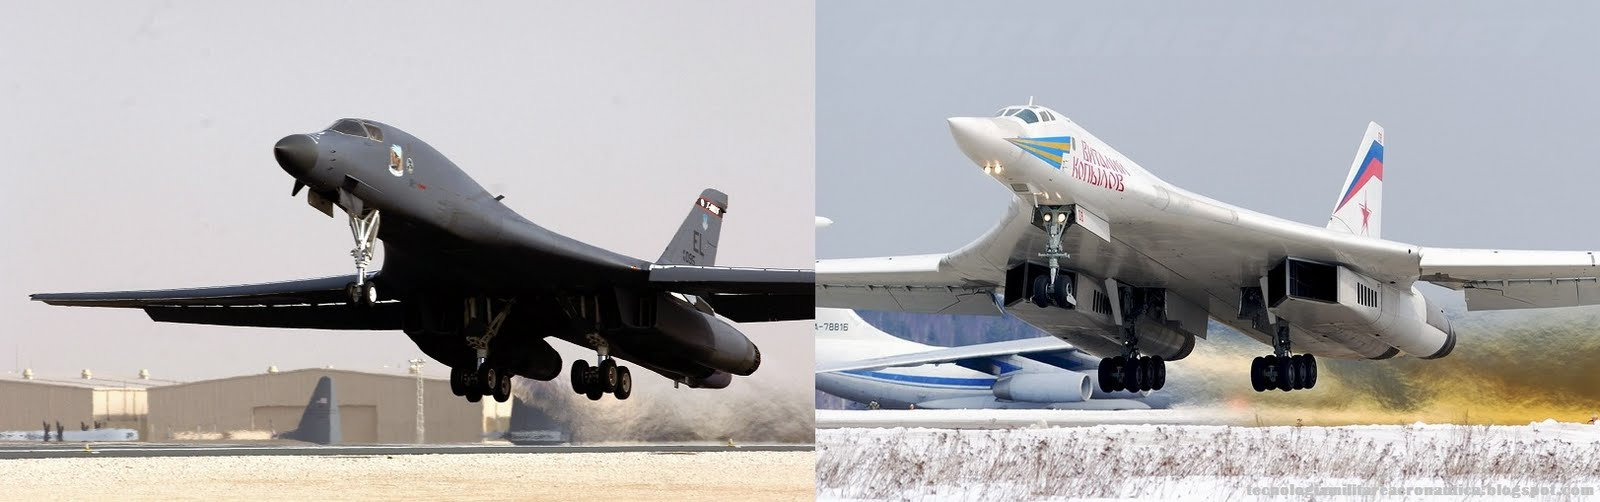 So, uhm, Lockheed Martin....-Page 3  Off-Topic Discussion ... B1 Lancer Vs Tu 160